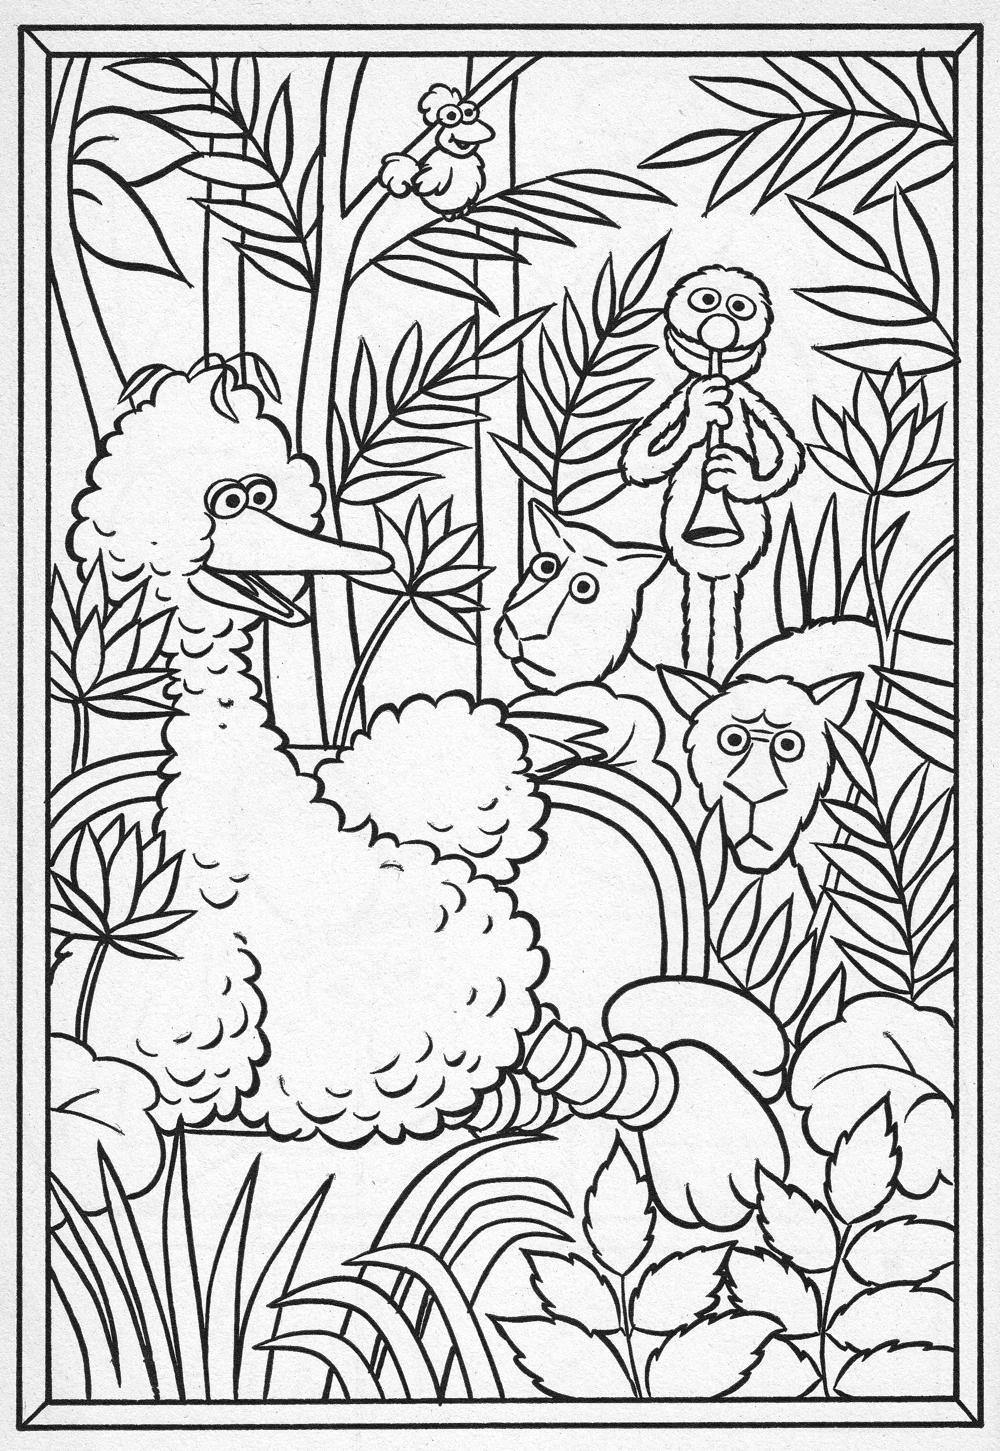 1000x1451 Henri Rousseau Monster Art, Big Bird And Coloring Books